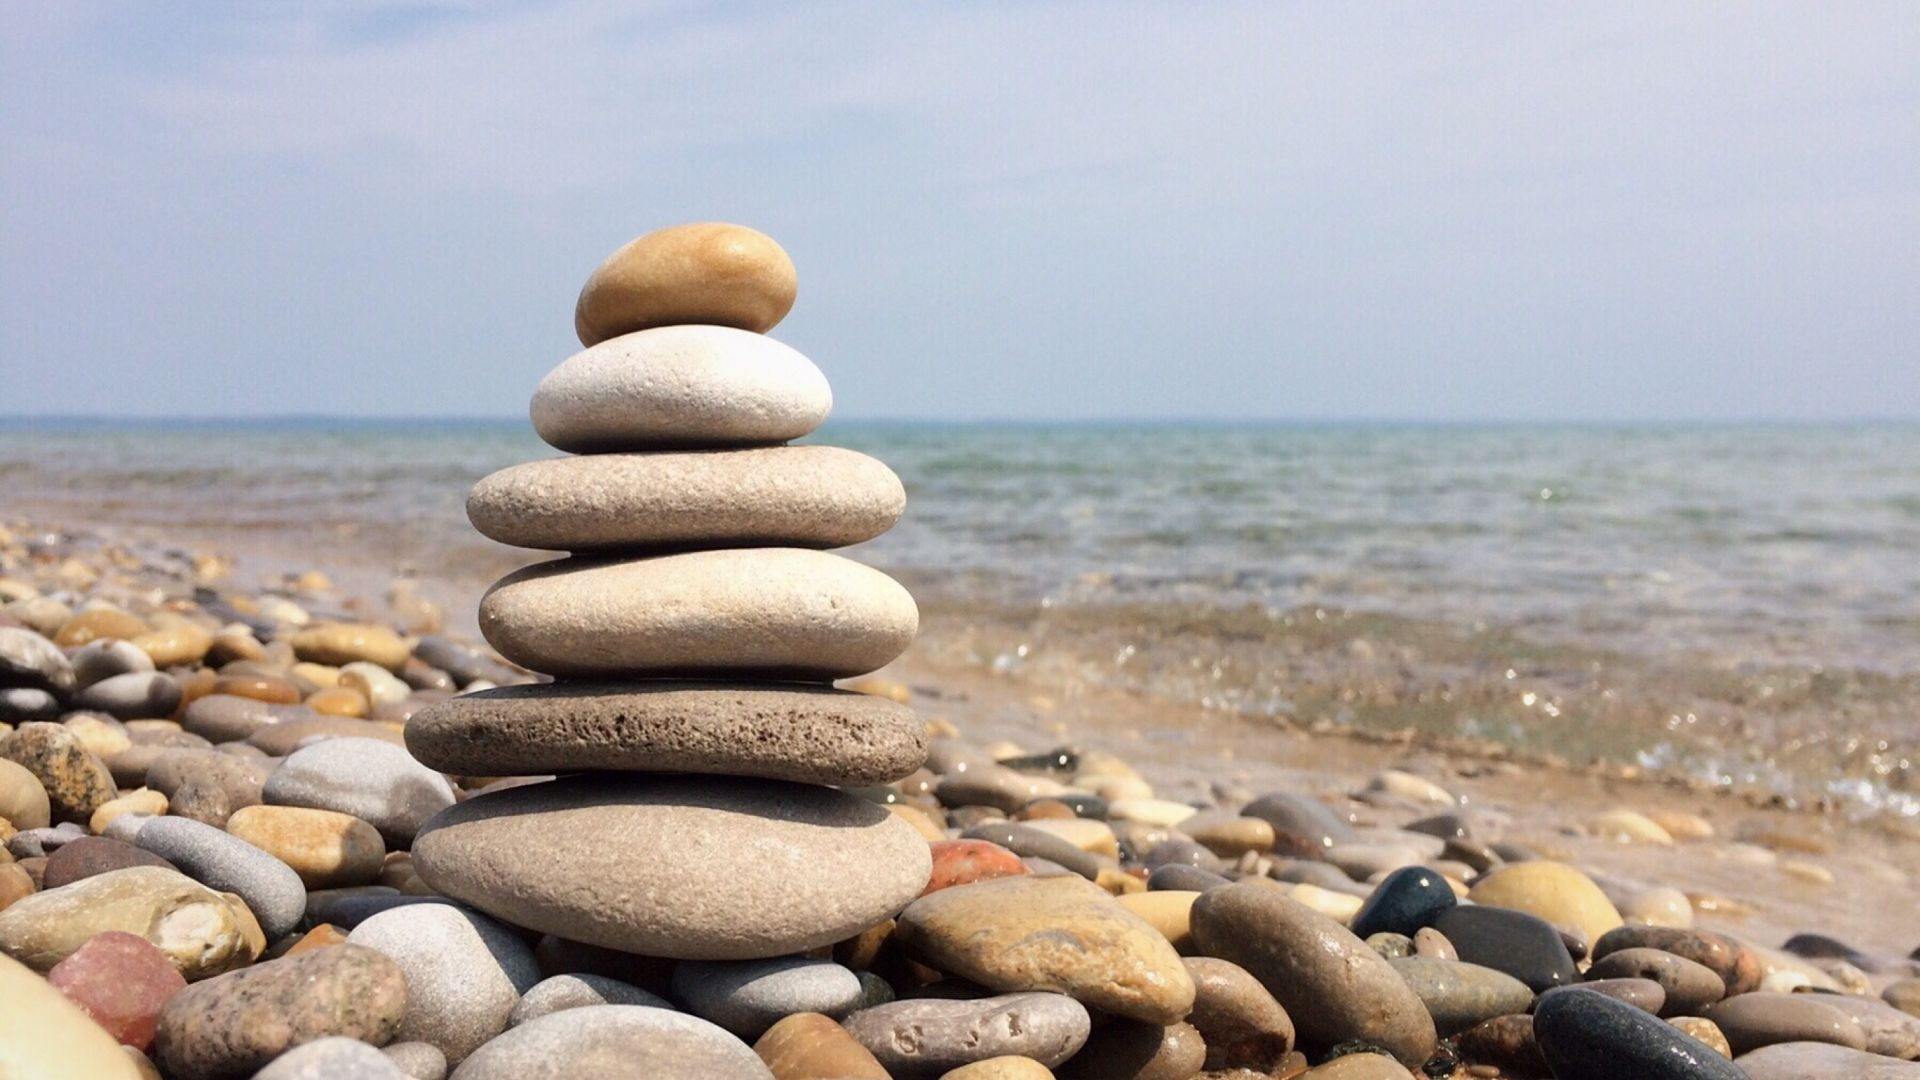 Wallpaper Rocks, balance, pebbles, beach, stones